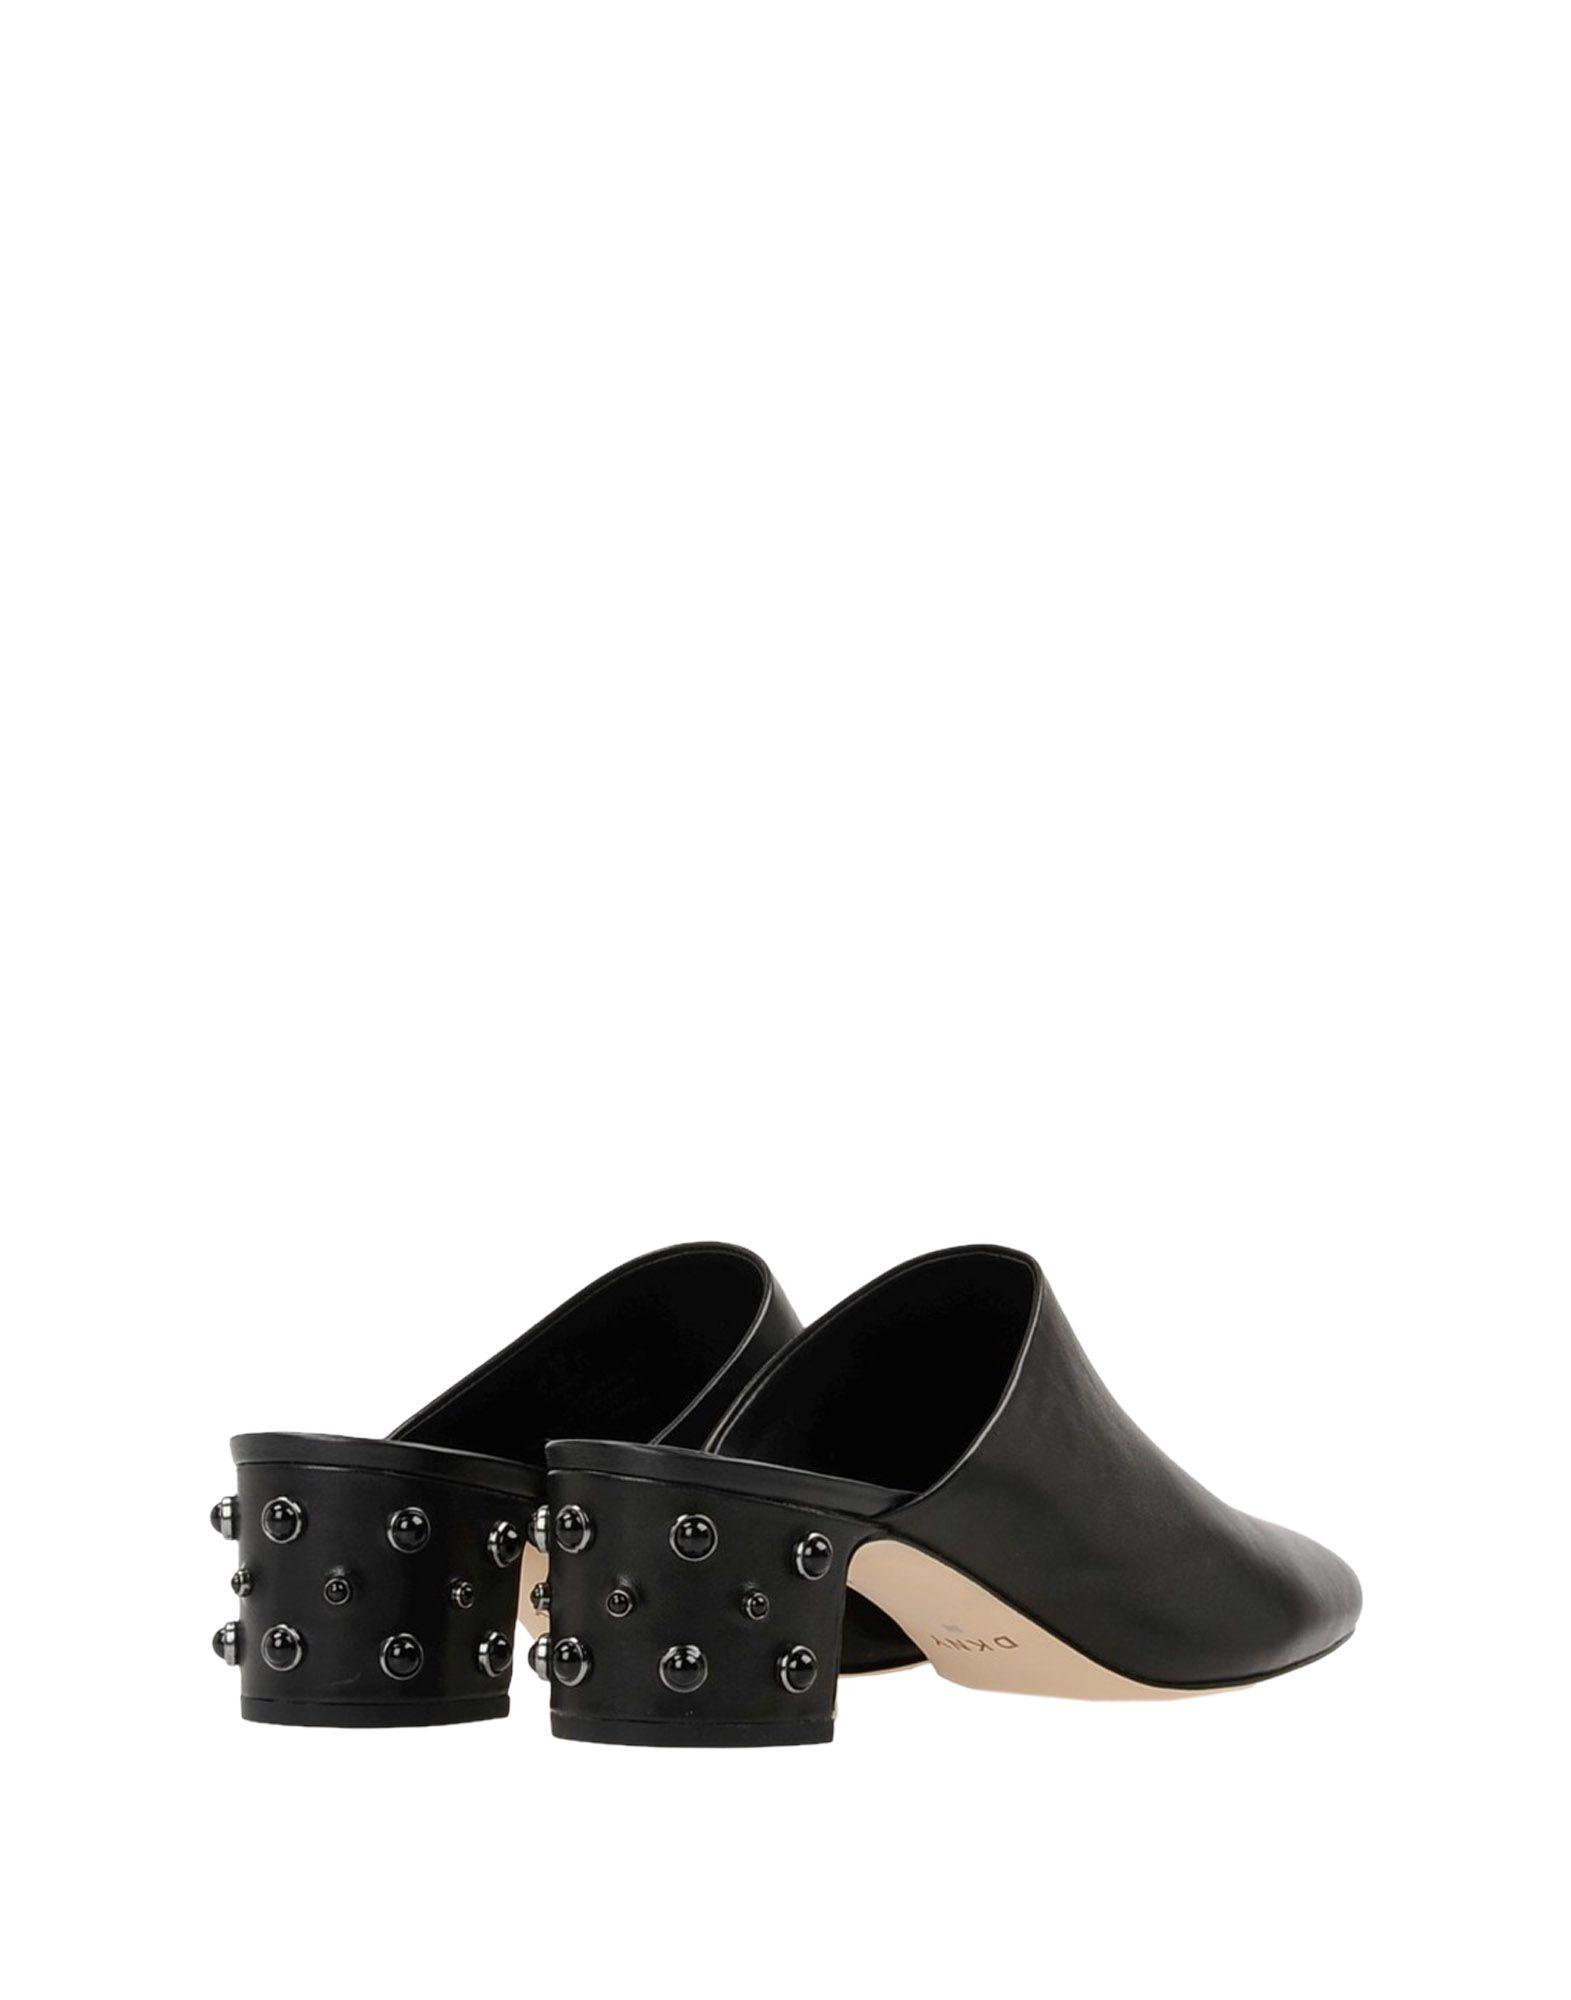 Mules Dkny Womens Sandals - Femme - Mules Dkny sur